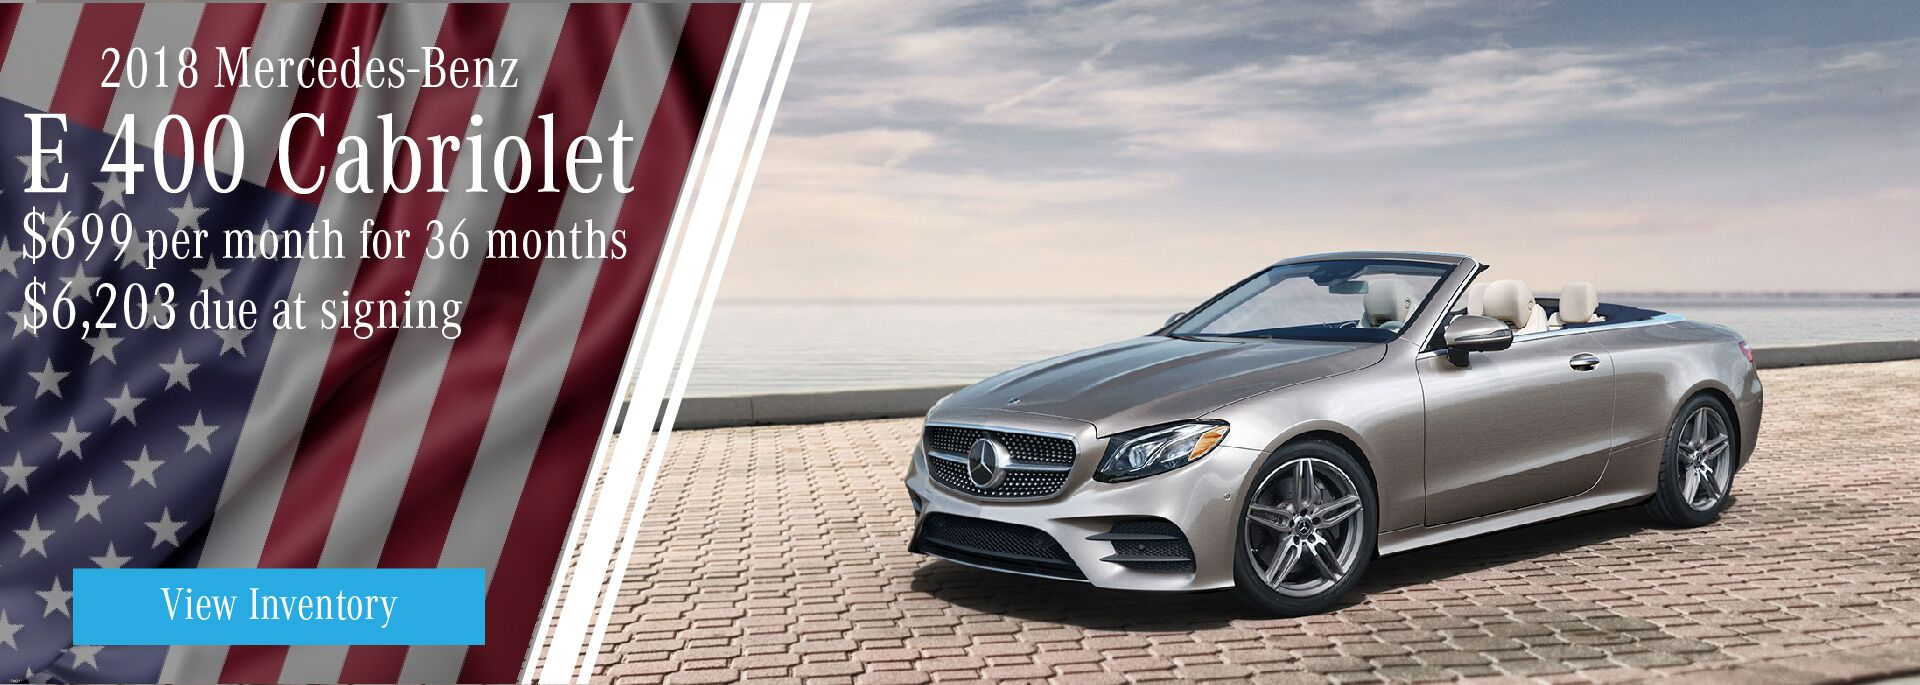 Mercedes-Benz Dealership Montgomery AL | Used Cars Jack ...